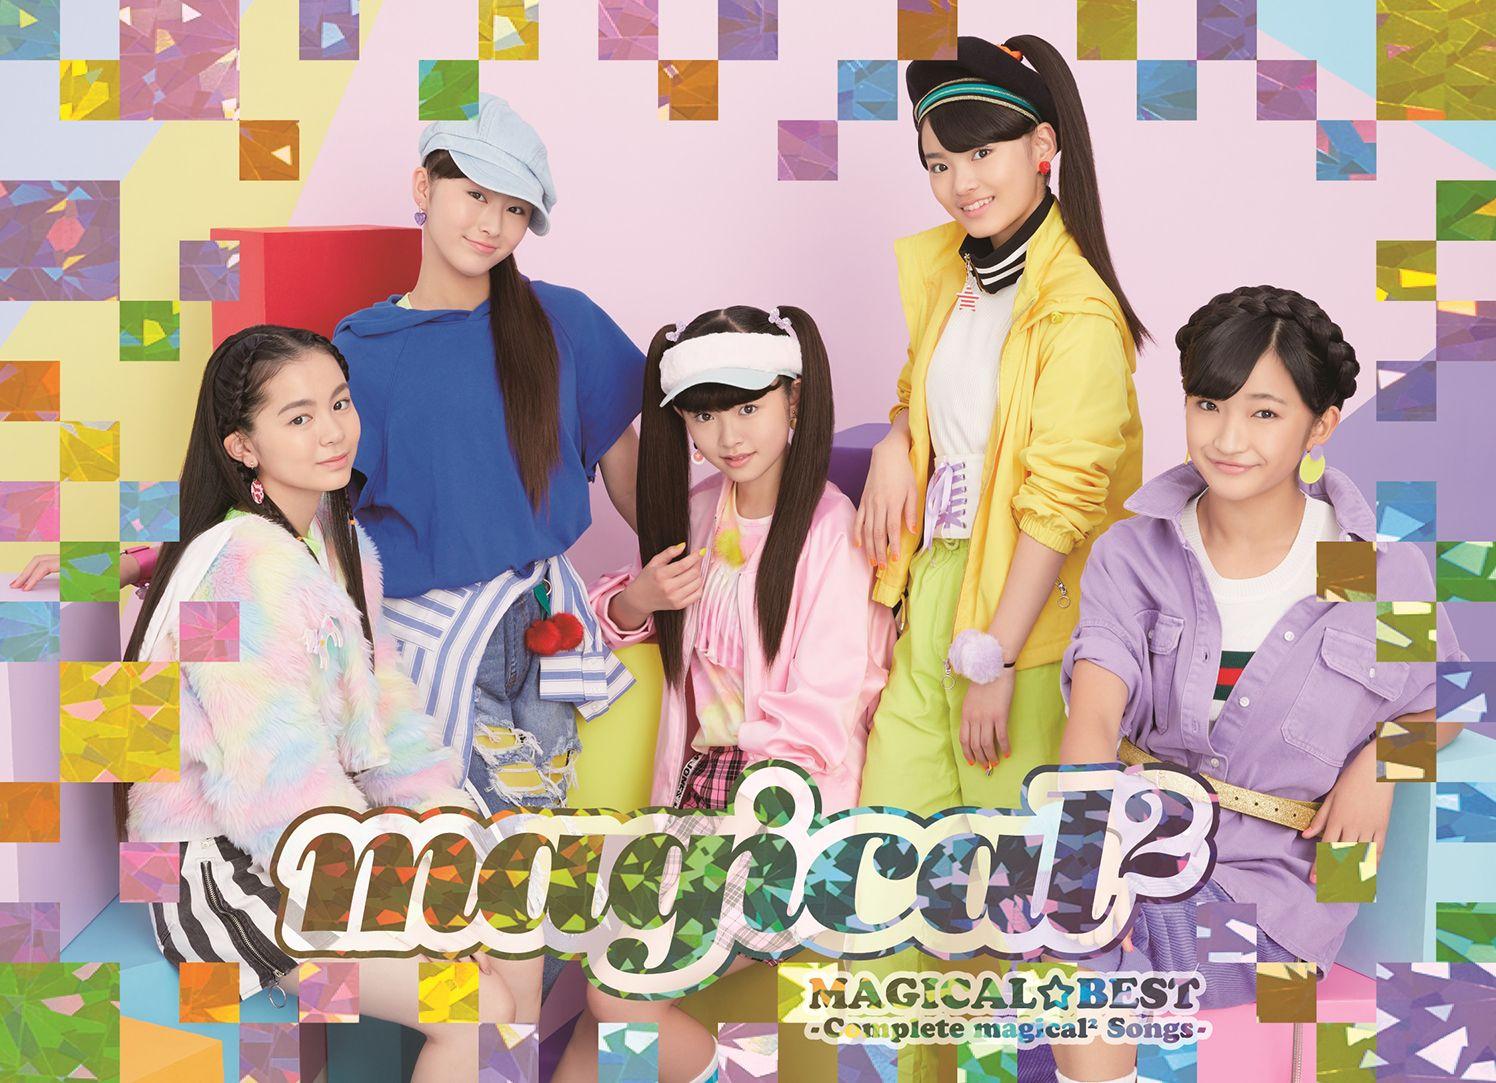 MAGICAL☆BEST -Complete magical2 Songs- (初回限定盤 CD+DVD) (ライブ盤) [ magical2 ]